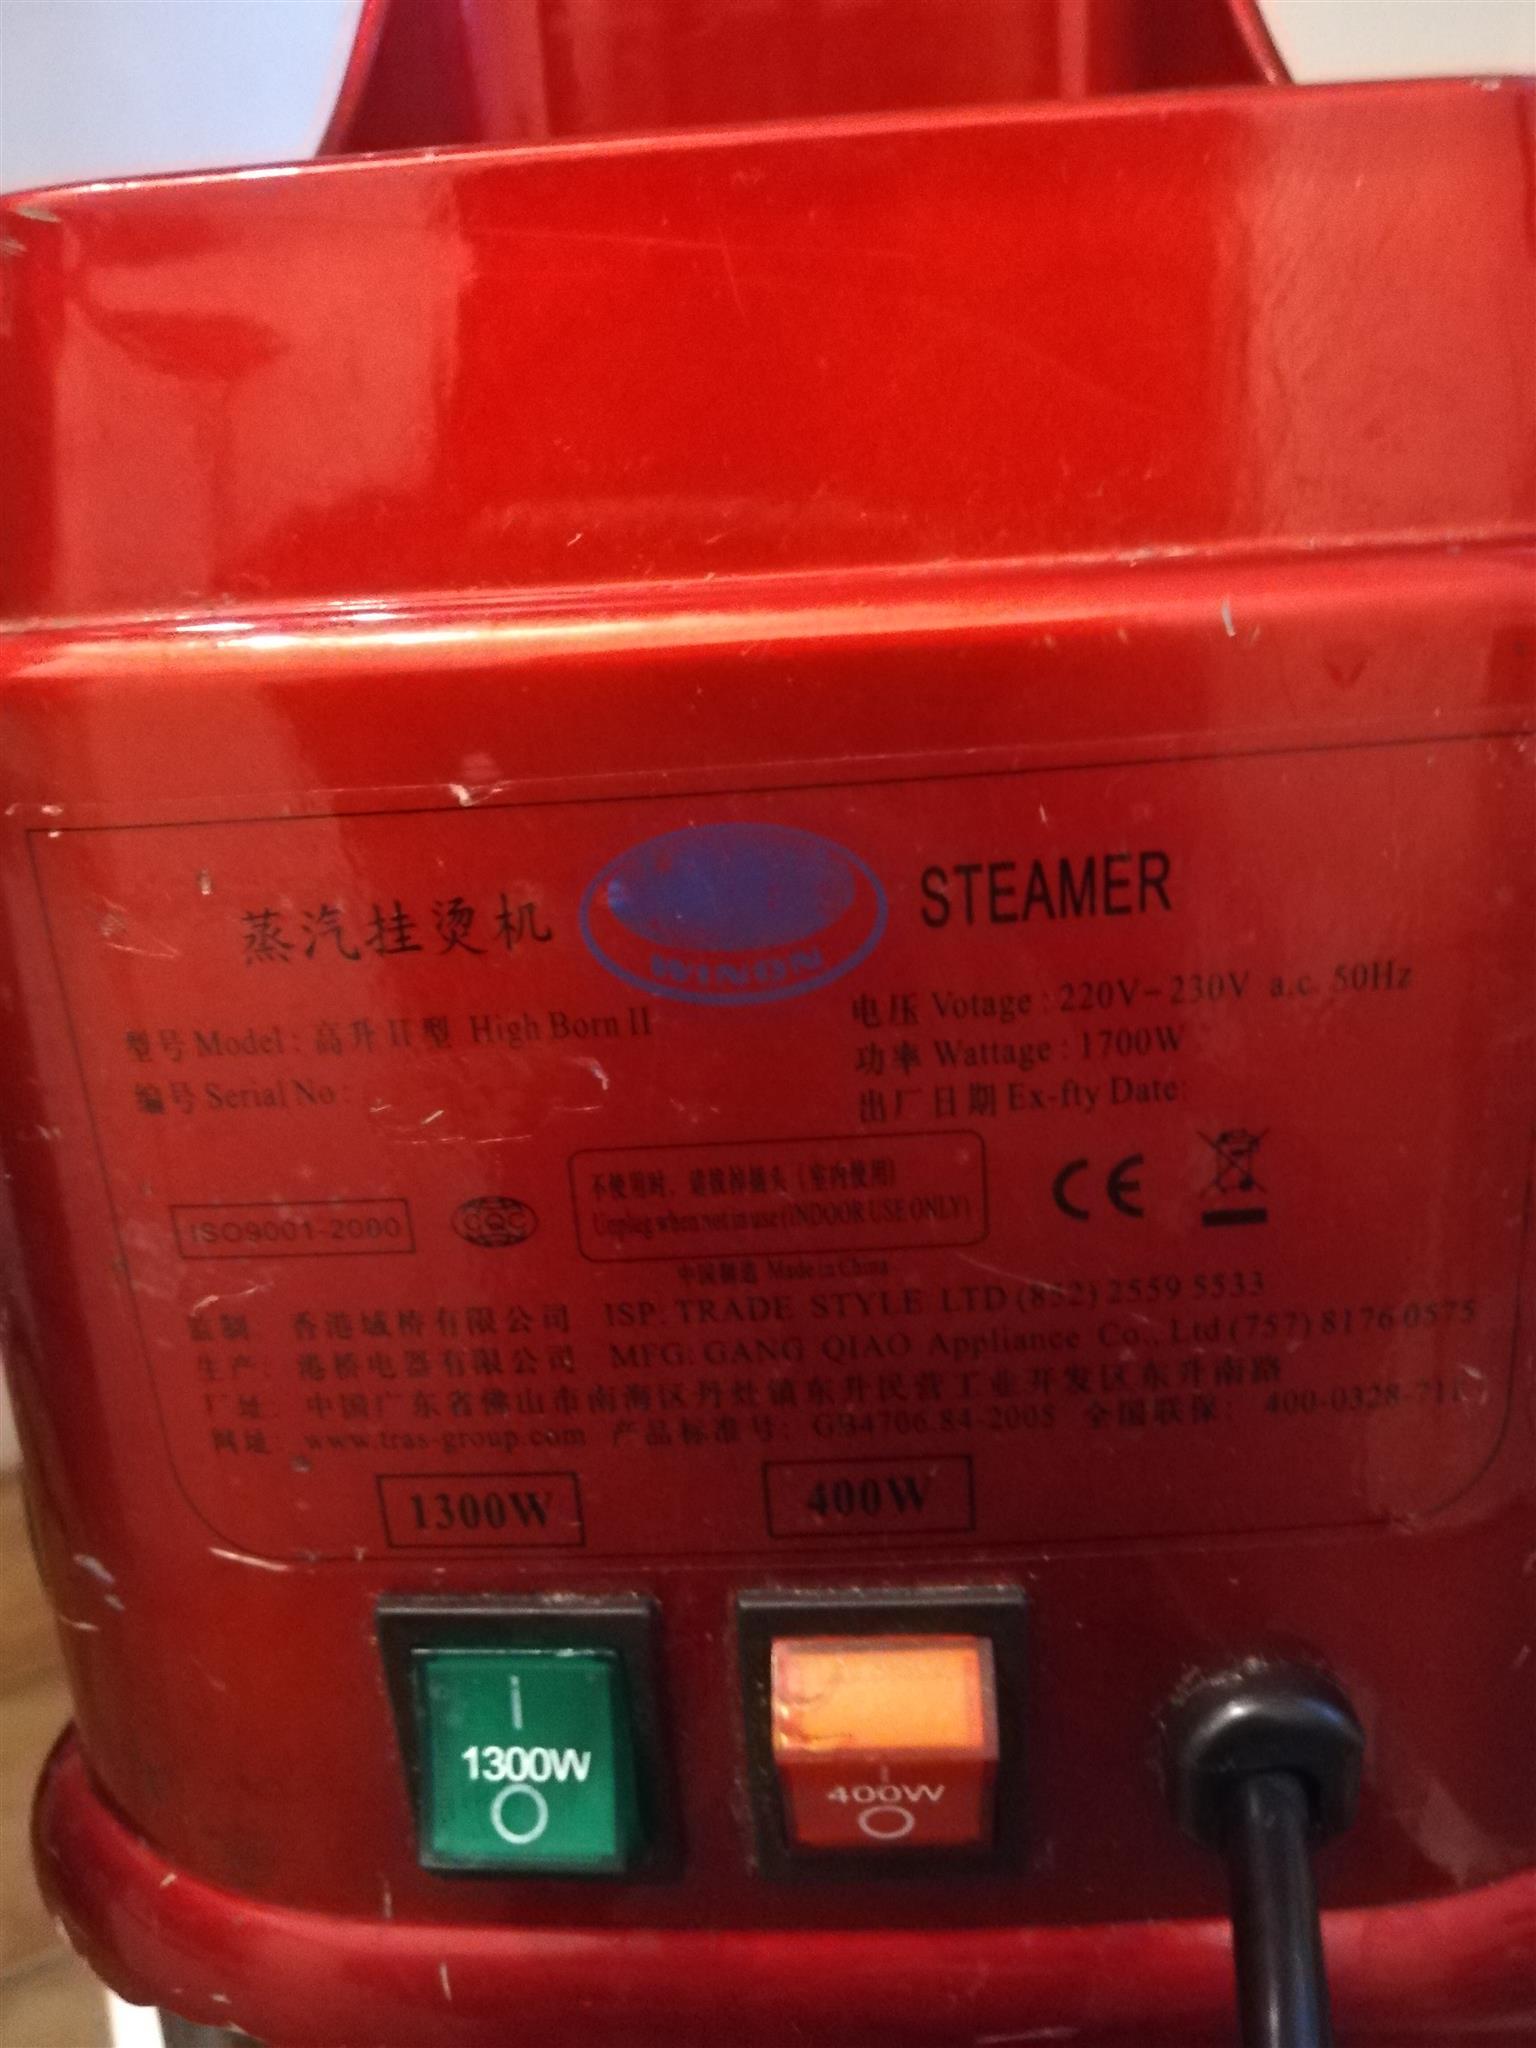 Clothing Steamer